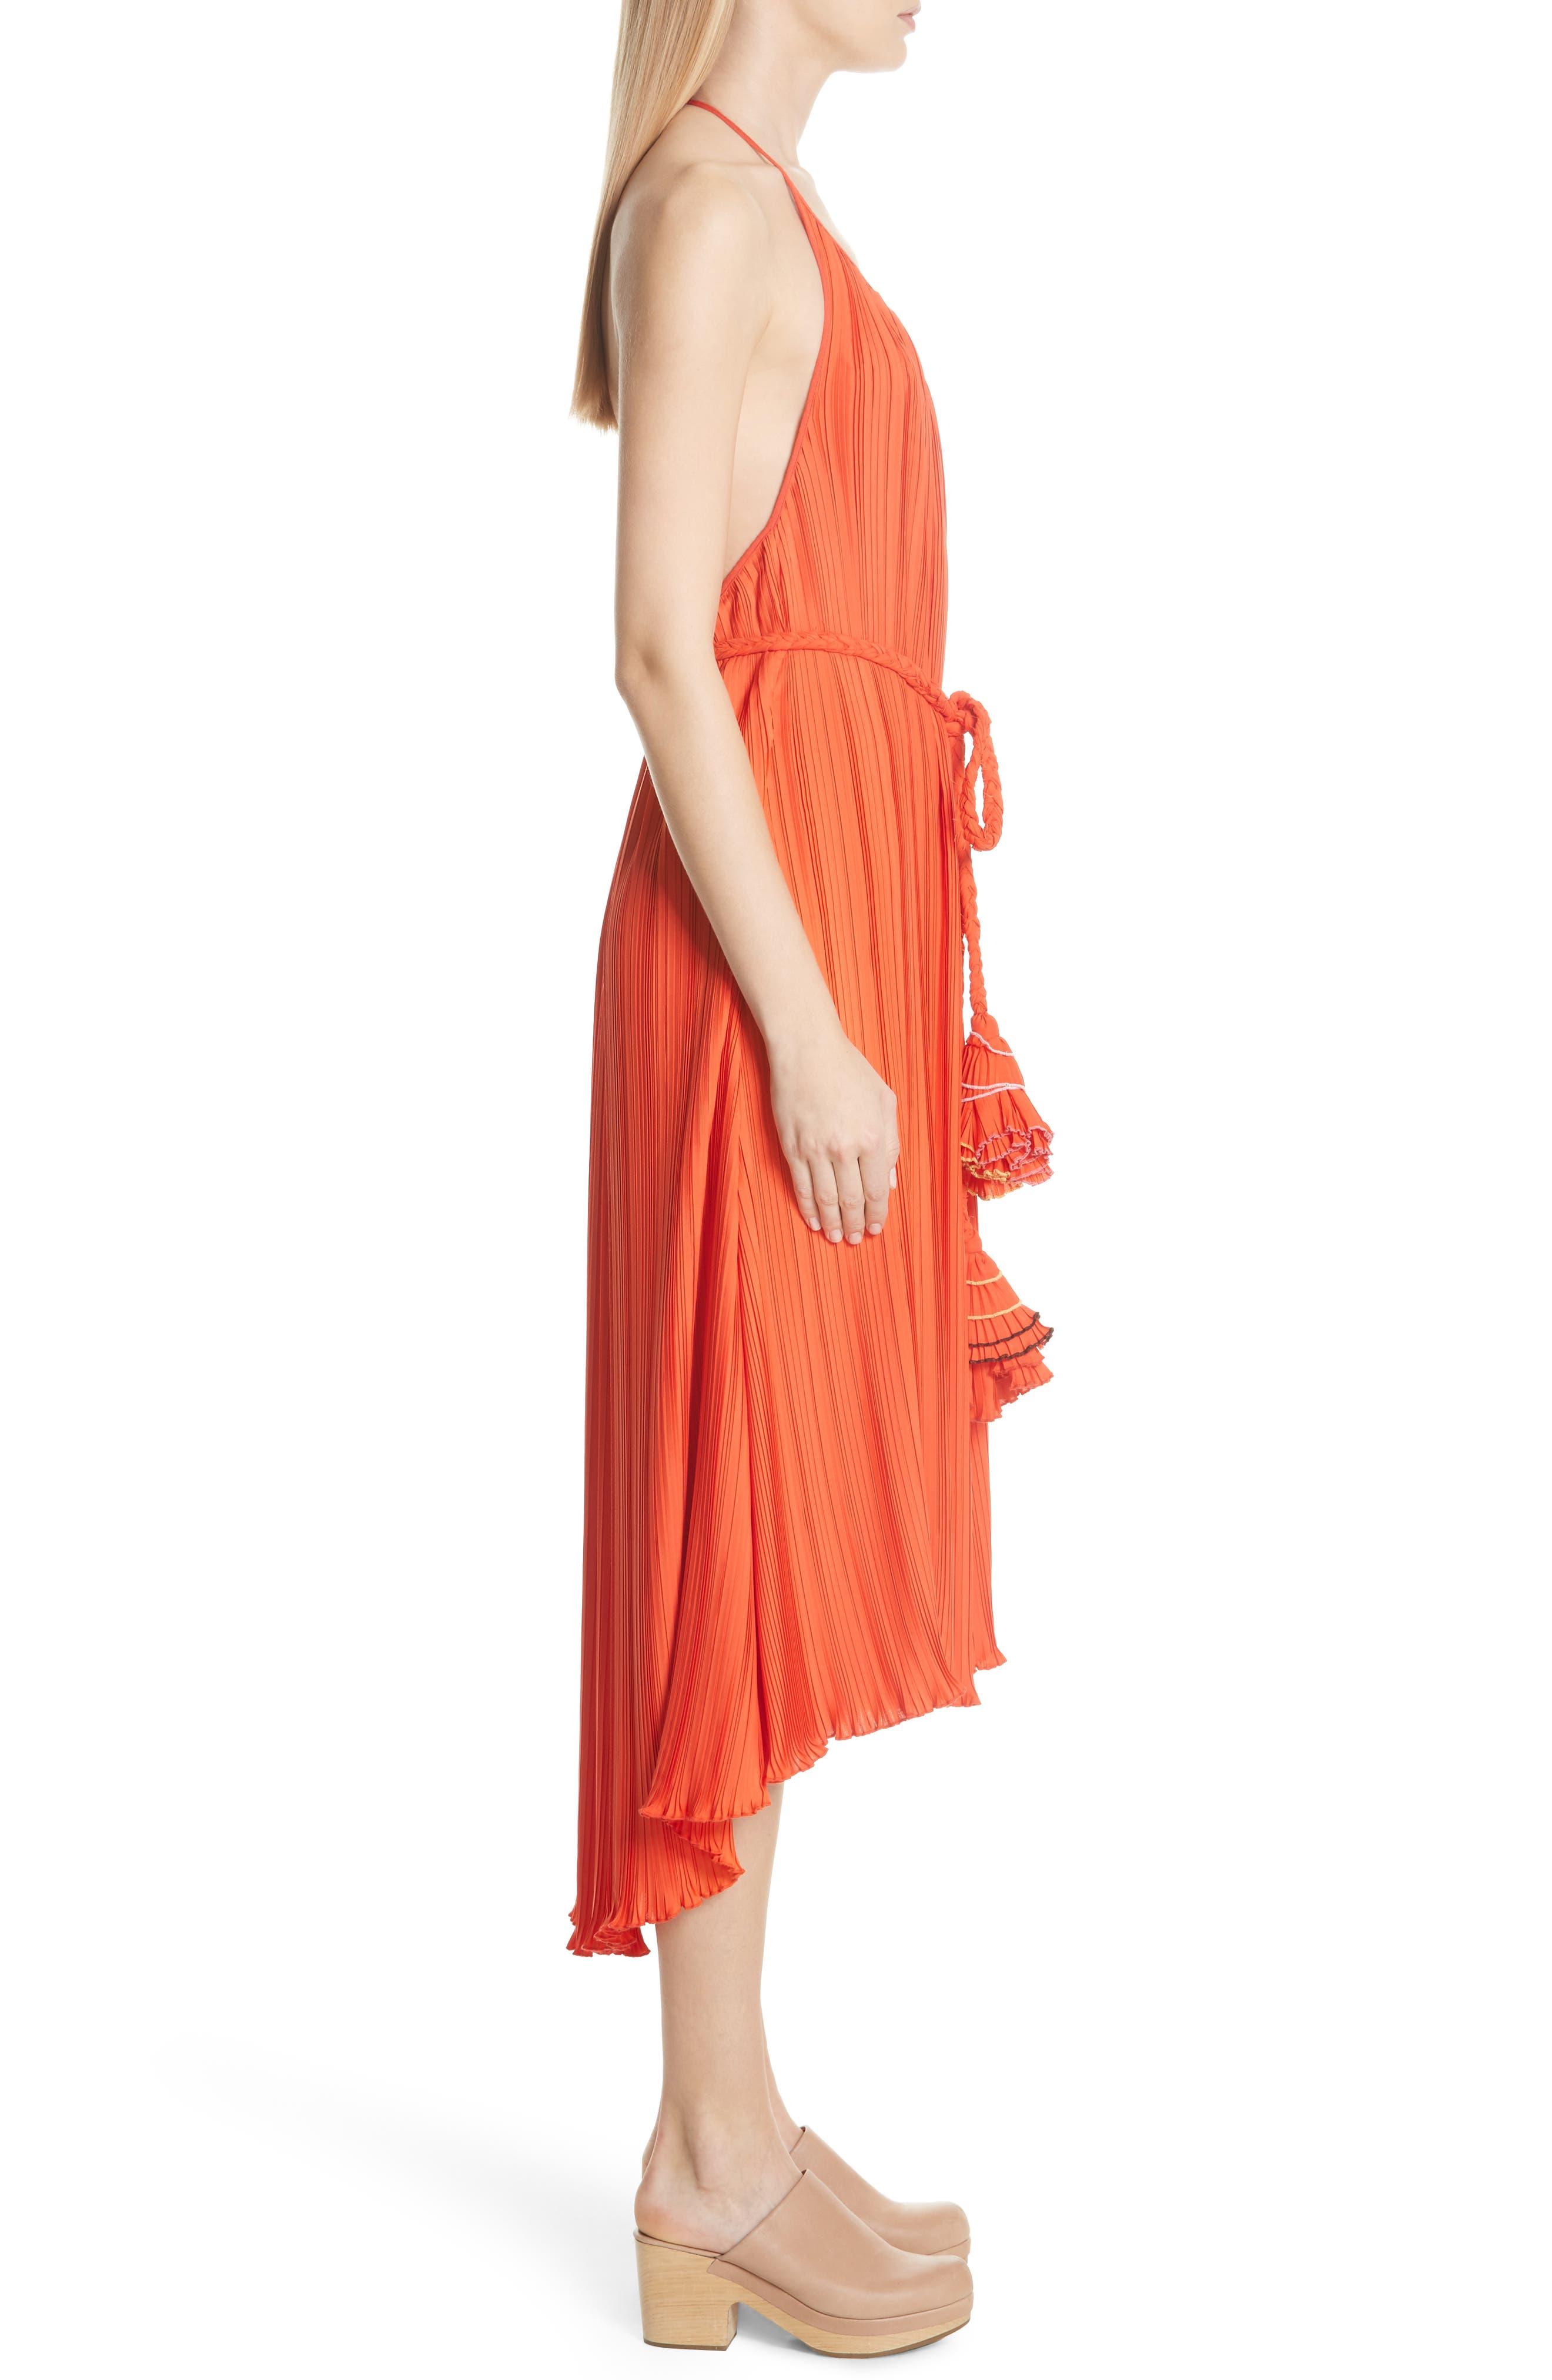 RACHEL COMEY,                             Sambuca Halter Dress,                             Alternate thumbnail 3, color,                             959